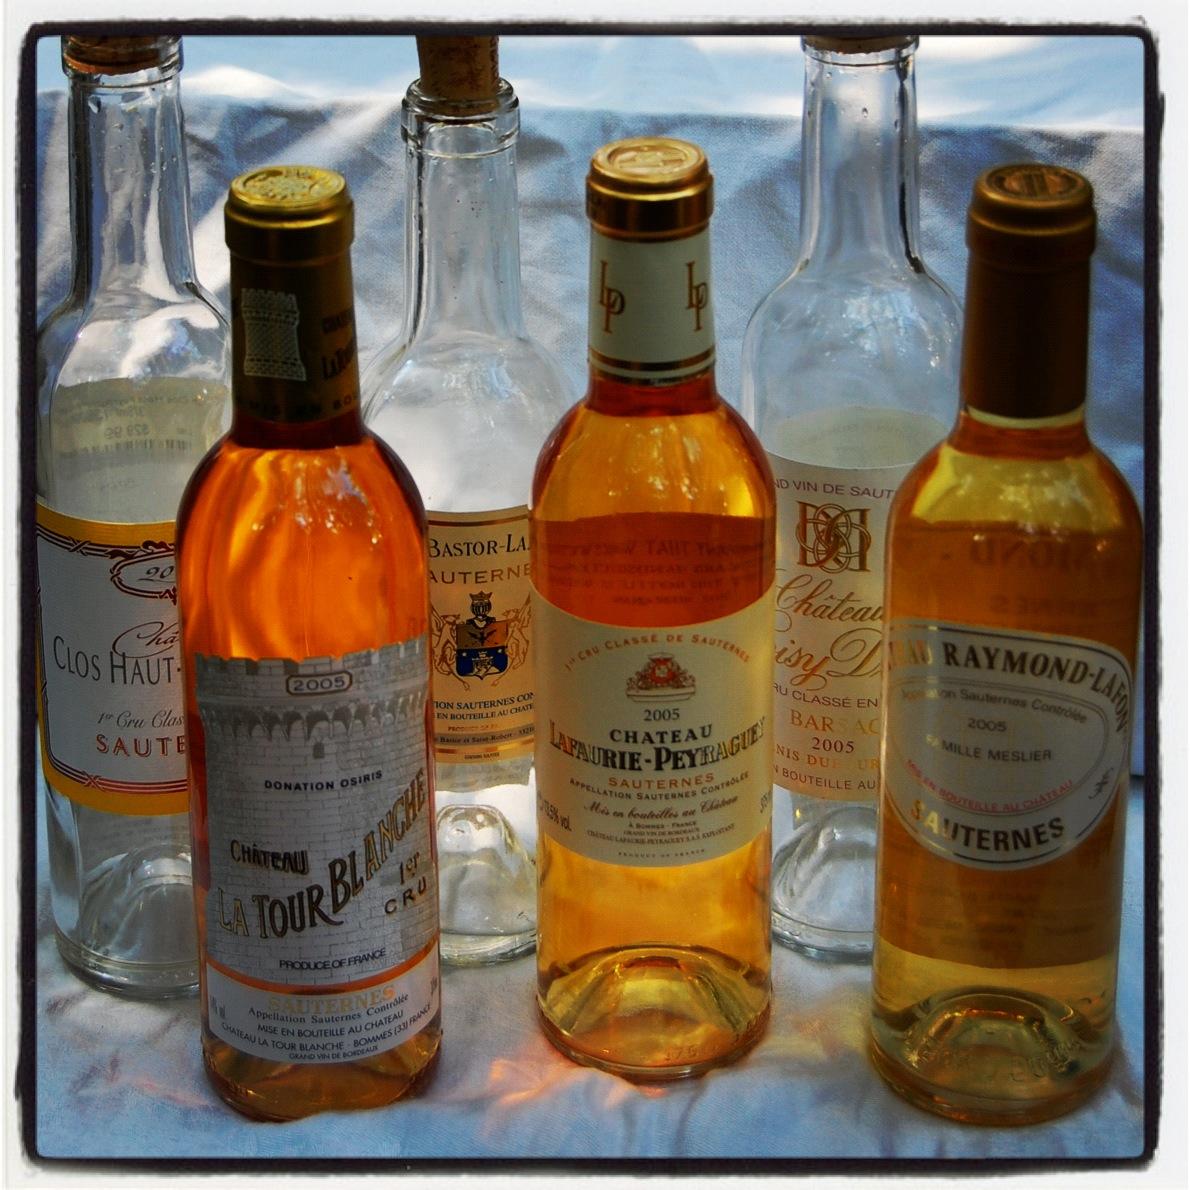 We Taste a Small Selection of 2005 Sauternes | Hogshead - A Wine Blog